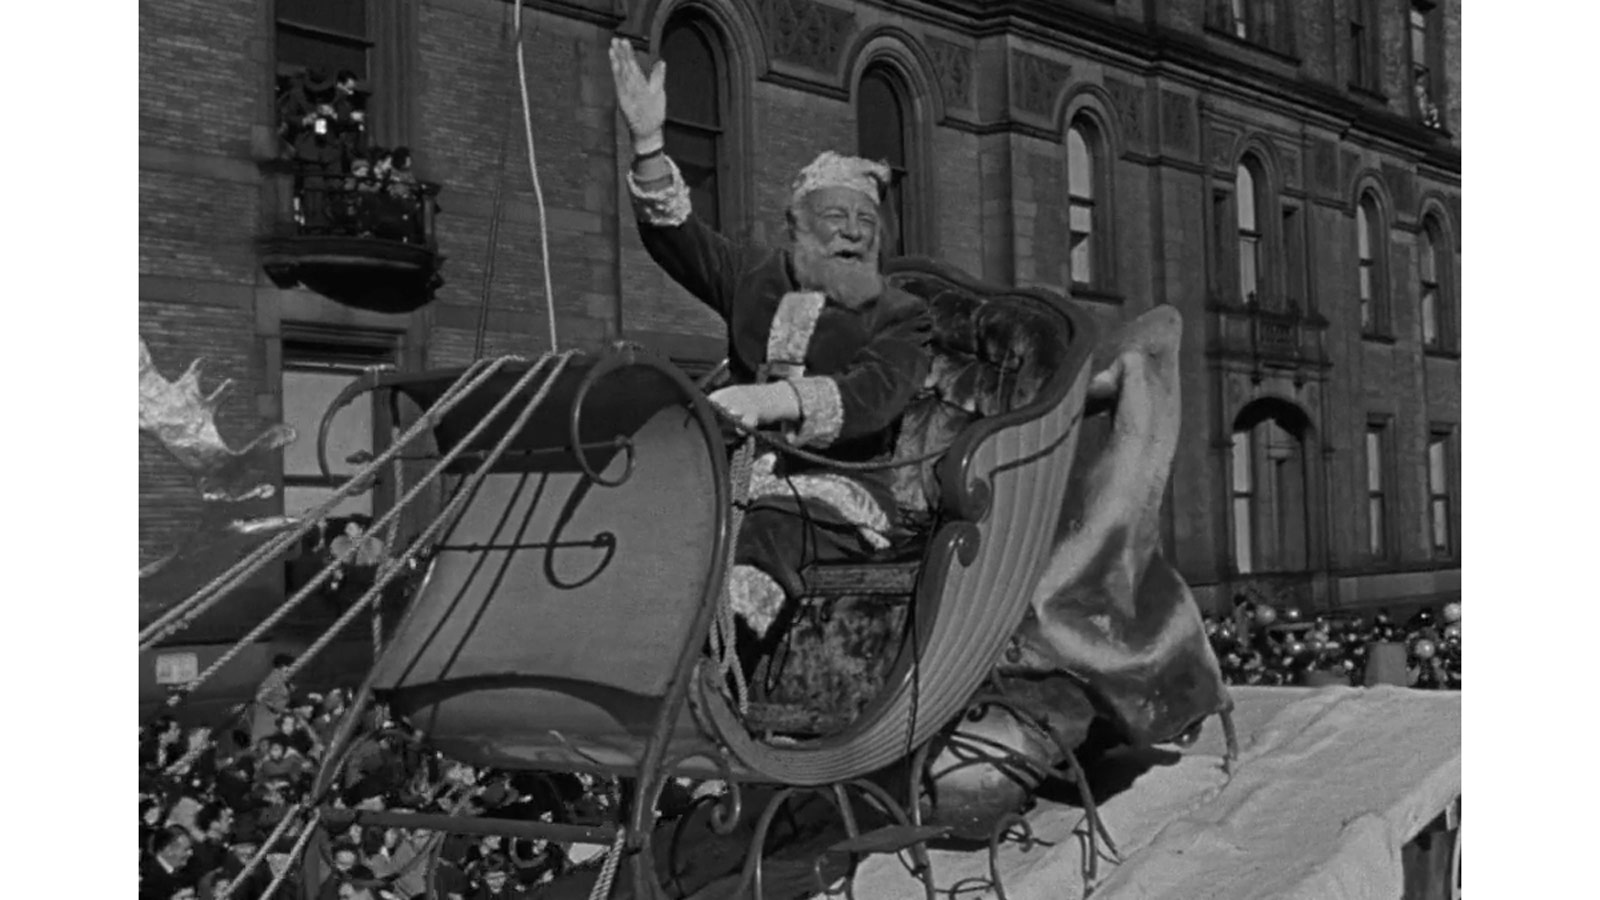 216502f65d665 https   www.cnn.com travel gallery christmas-film-sites index.html 2017 ...